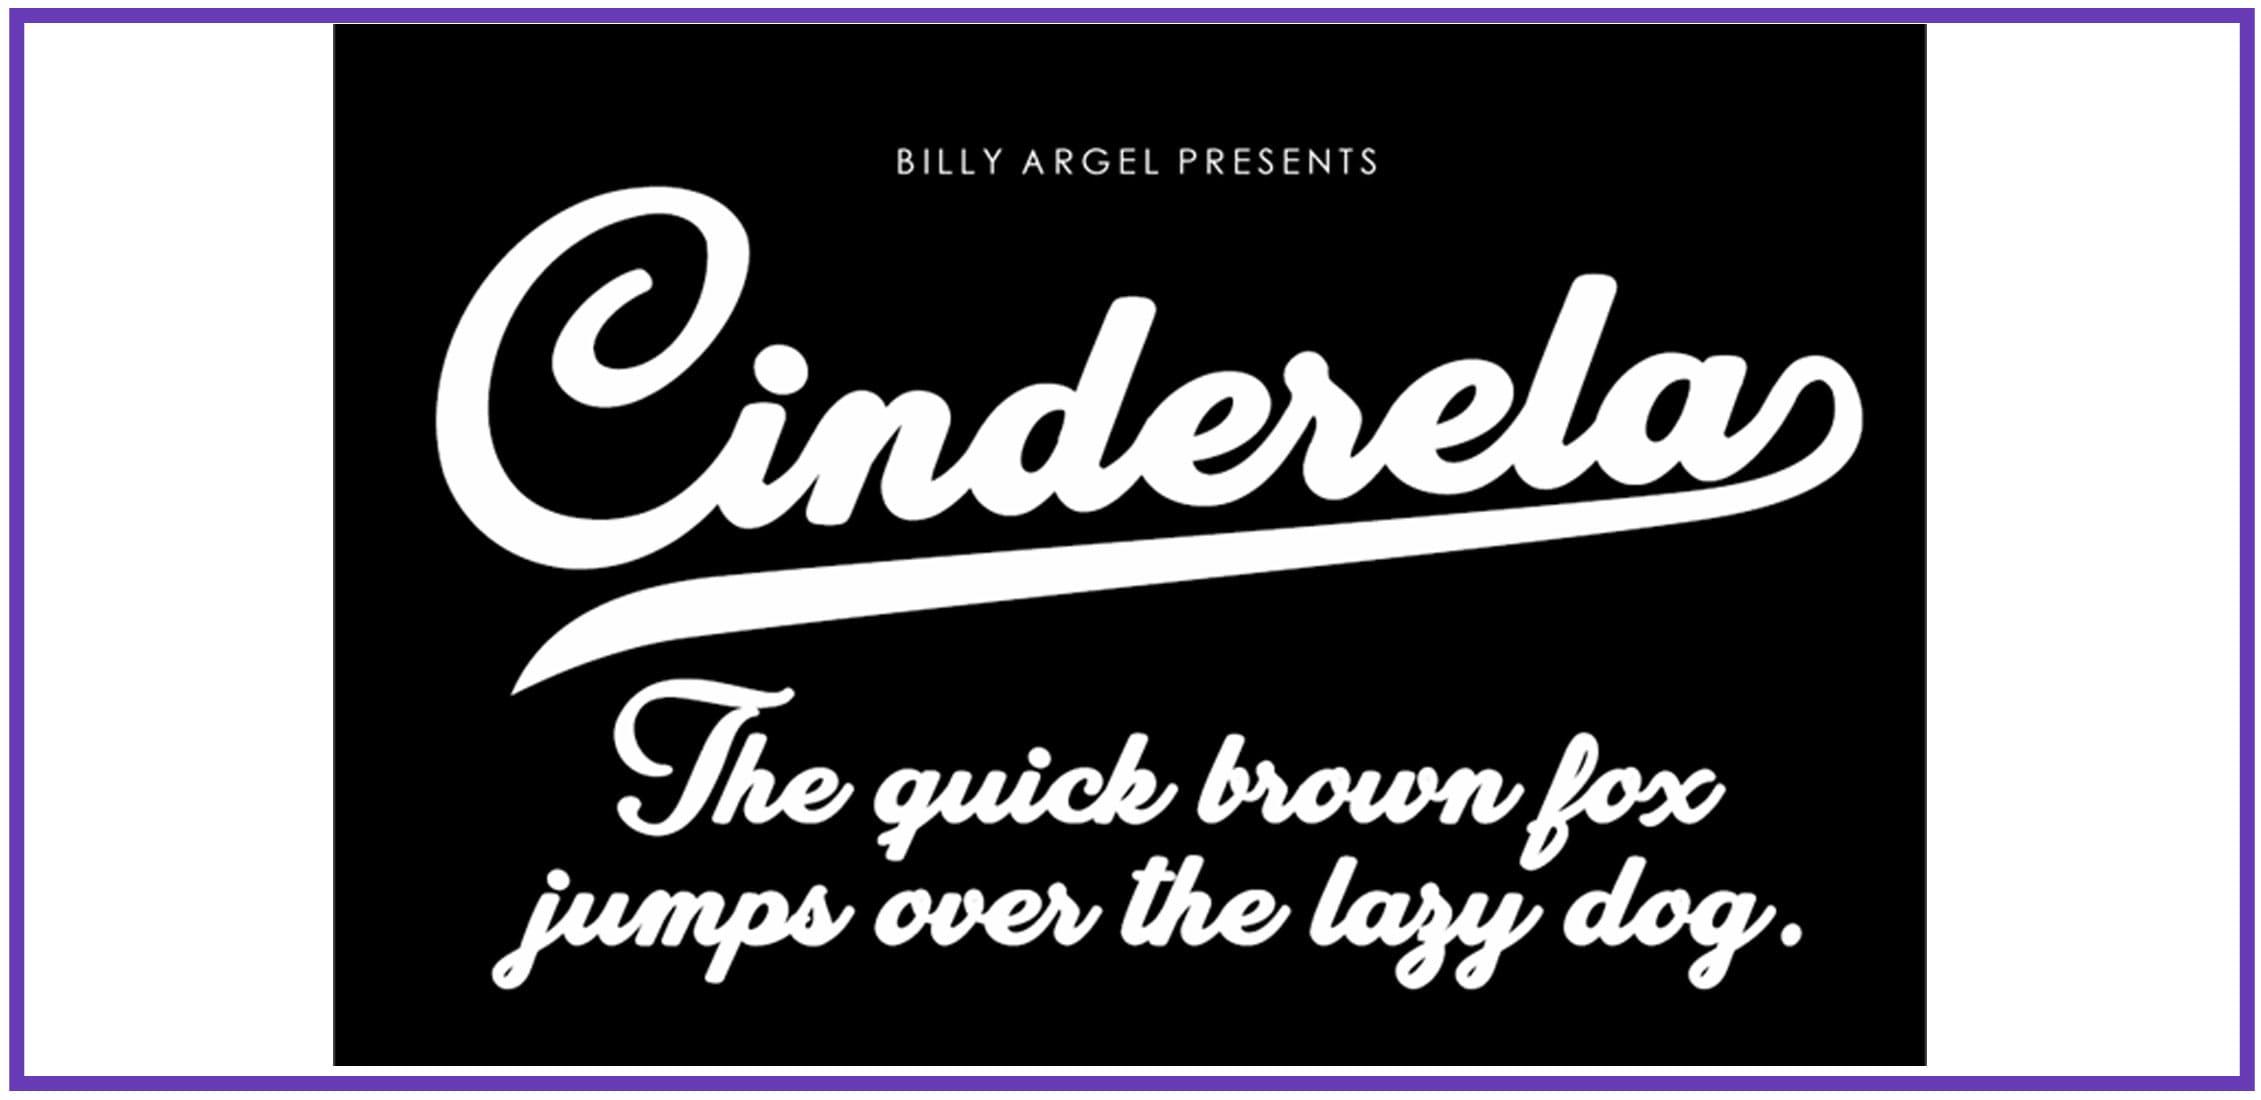 A script fun font on a black background.